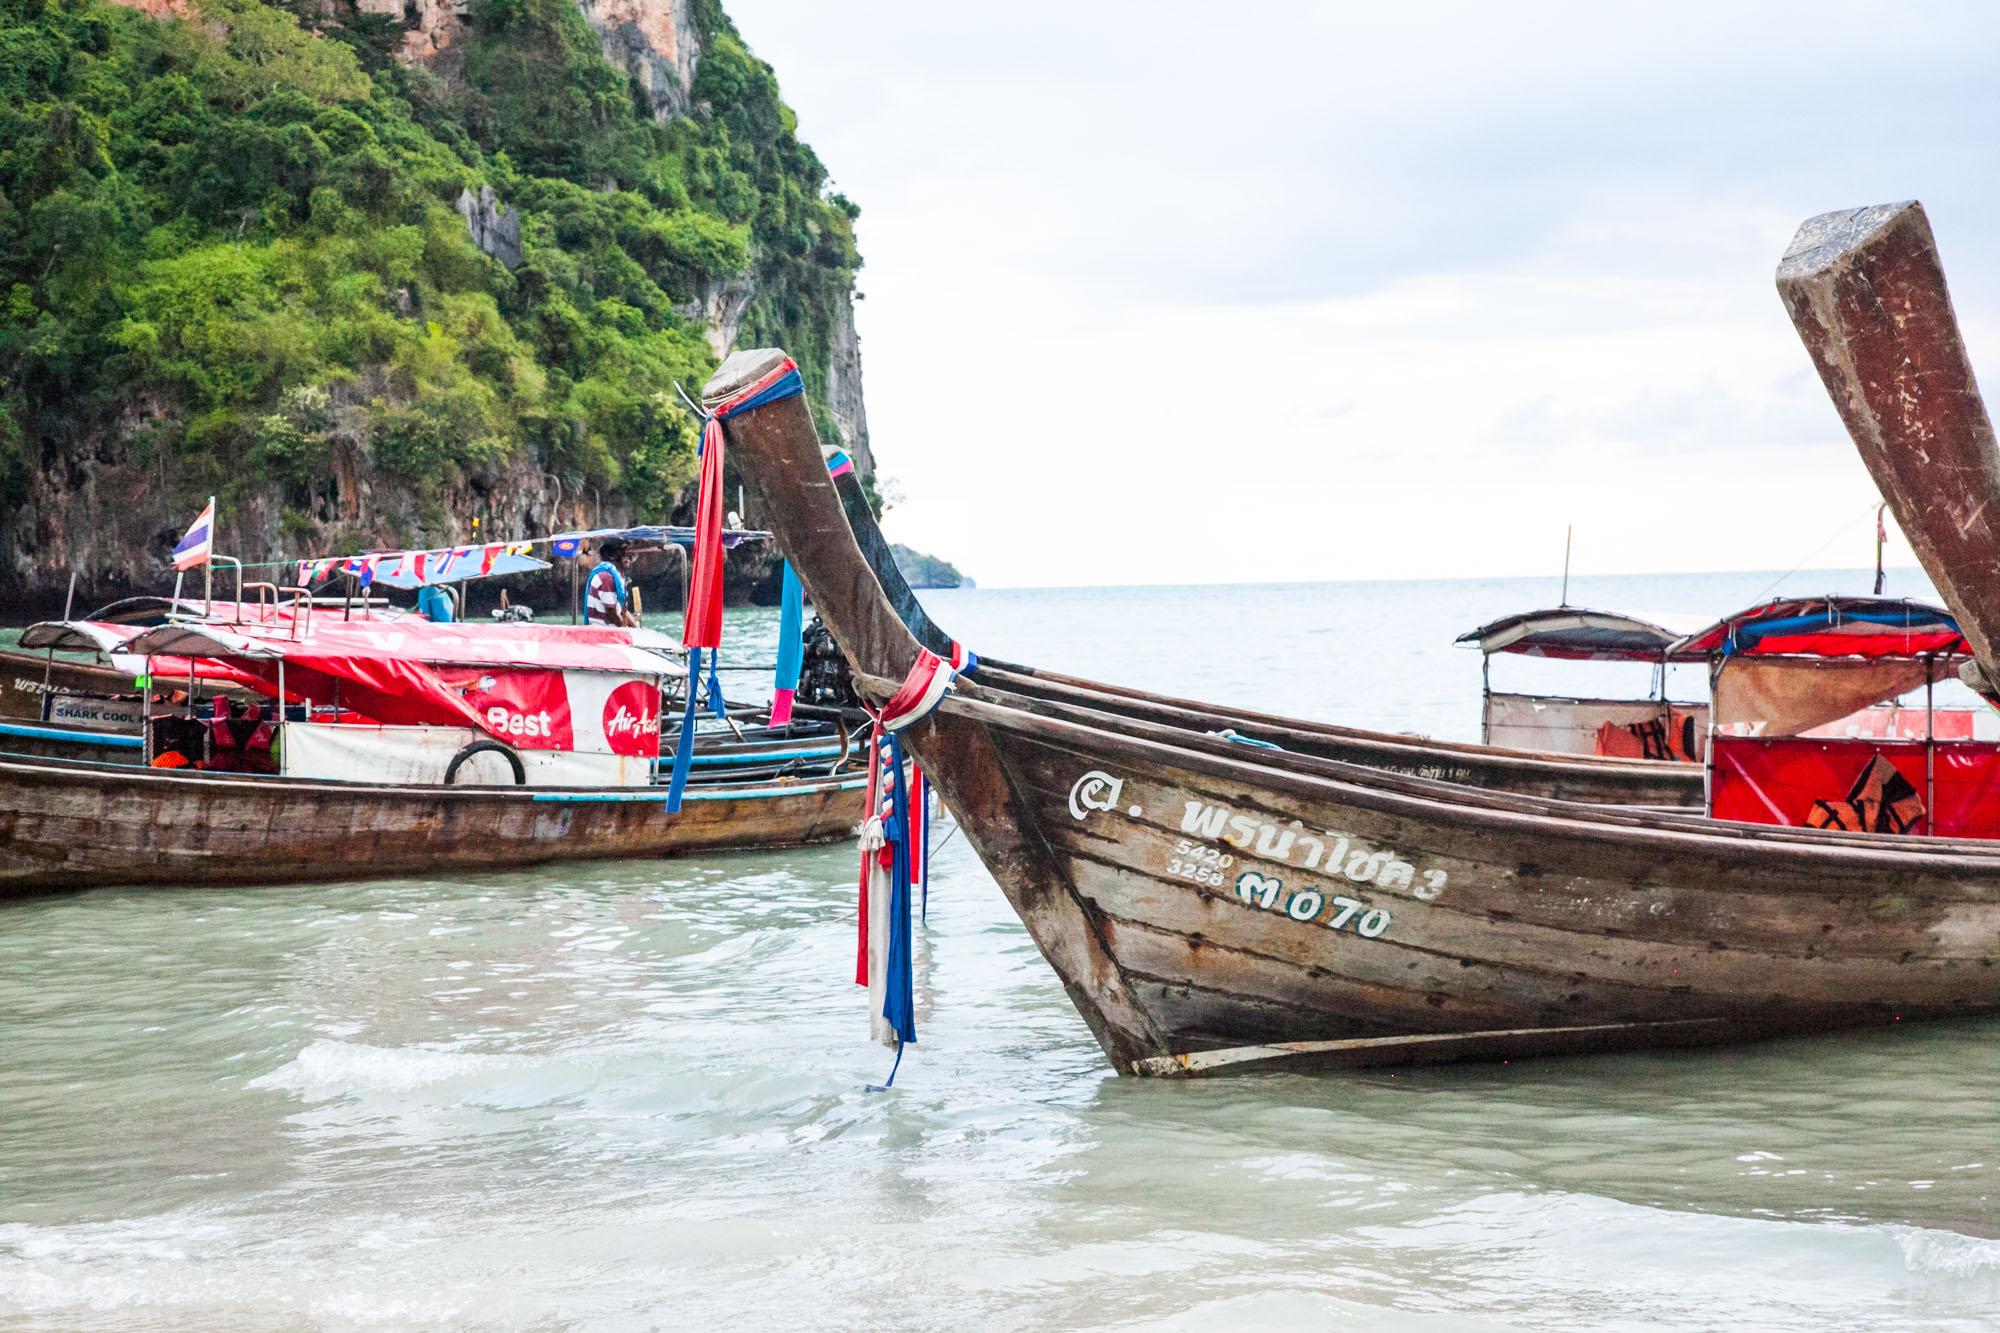 IMG_3647-railay-beach-thailand-traveling-trisa-taro.jpg